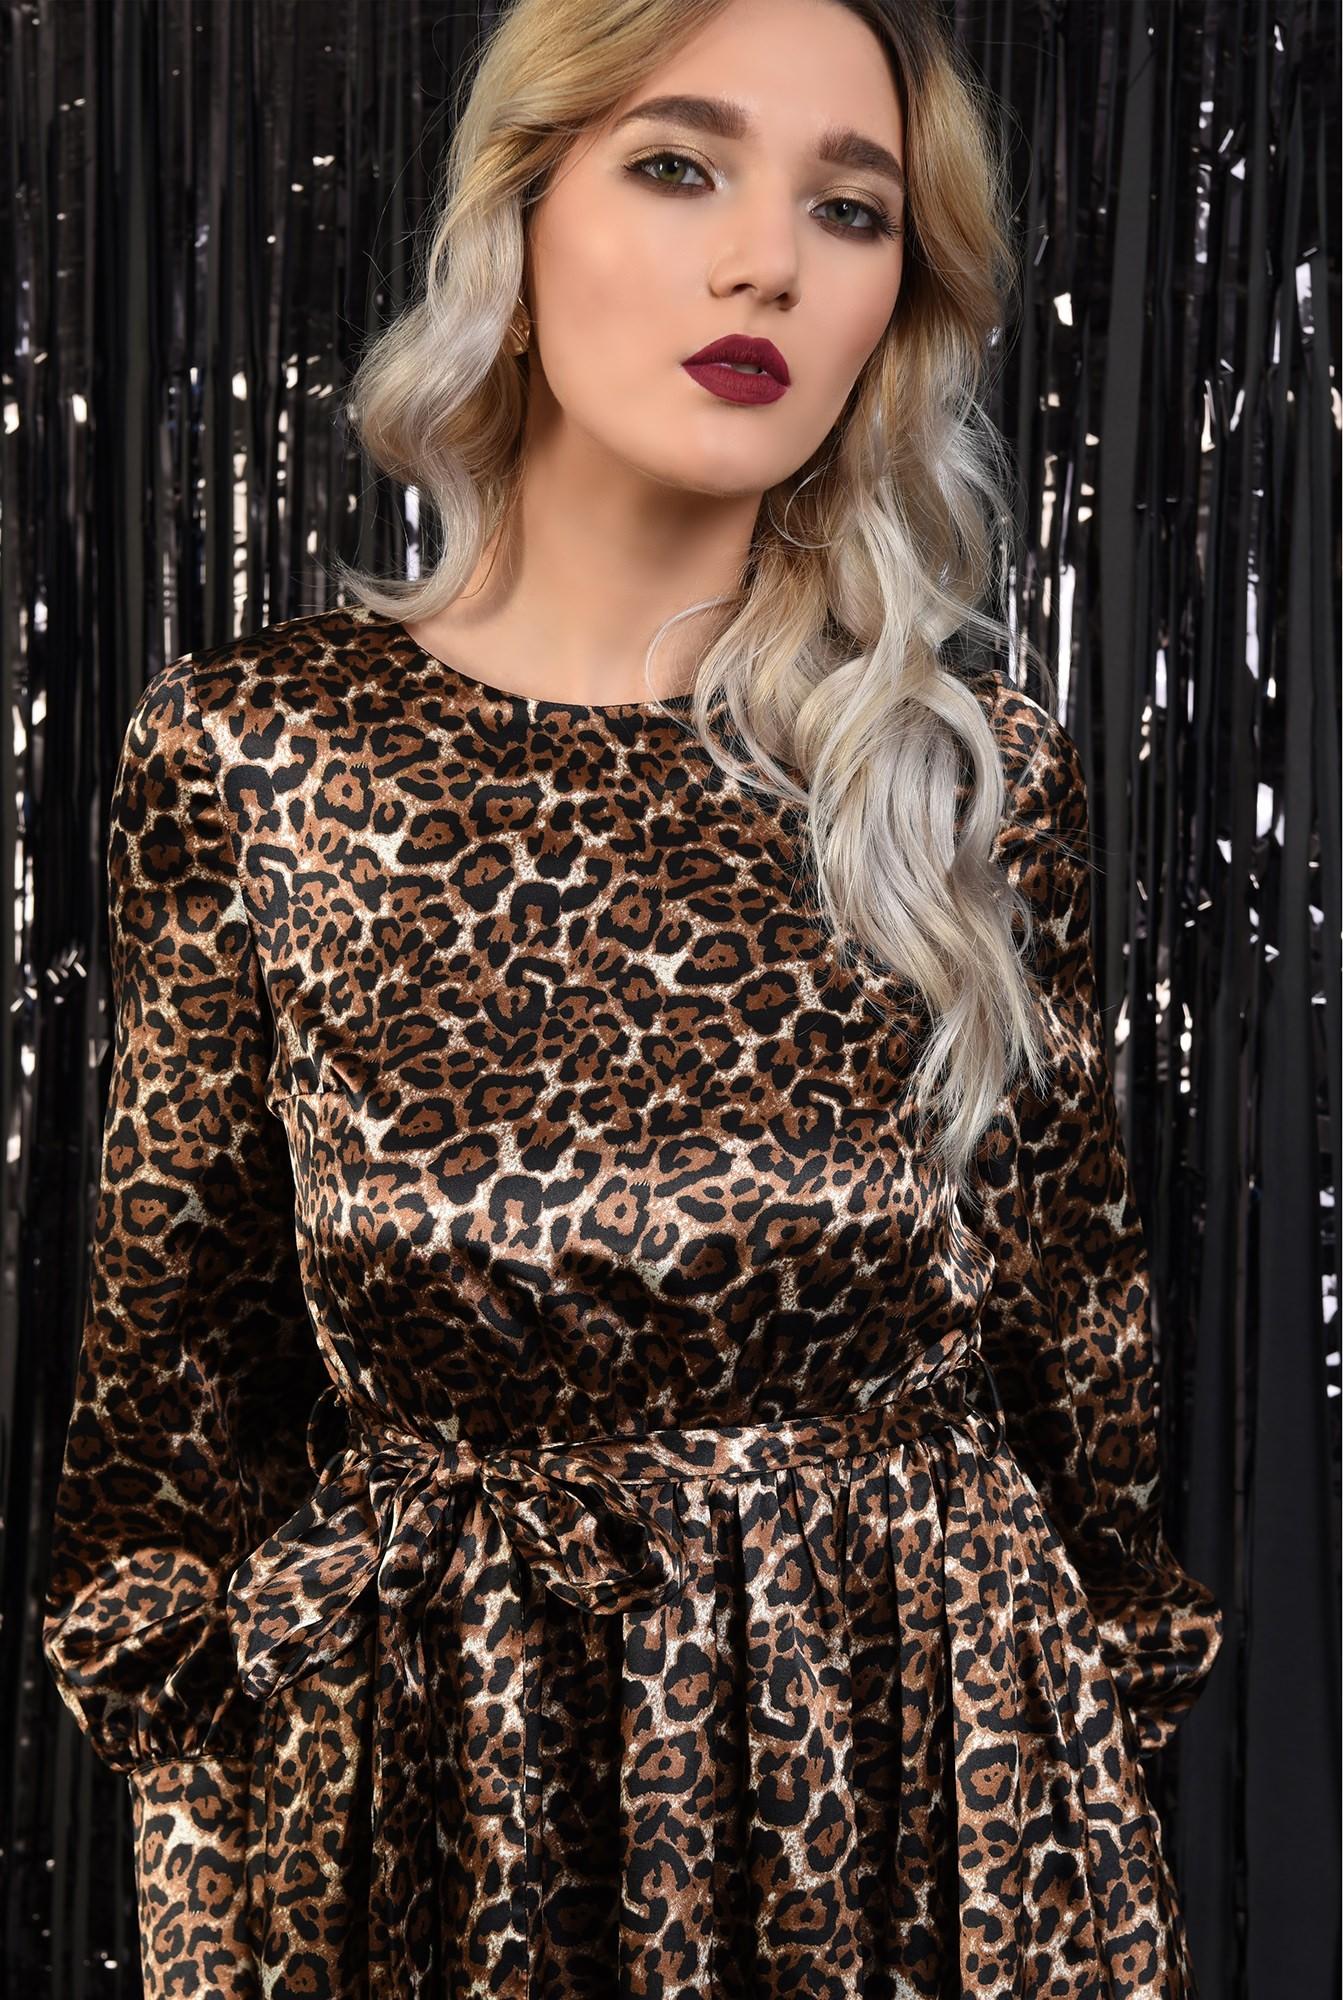 2 - 360 - rochie eleganta, din satin, animal print, nasturi la spate, evazata